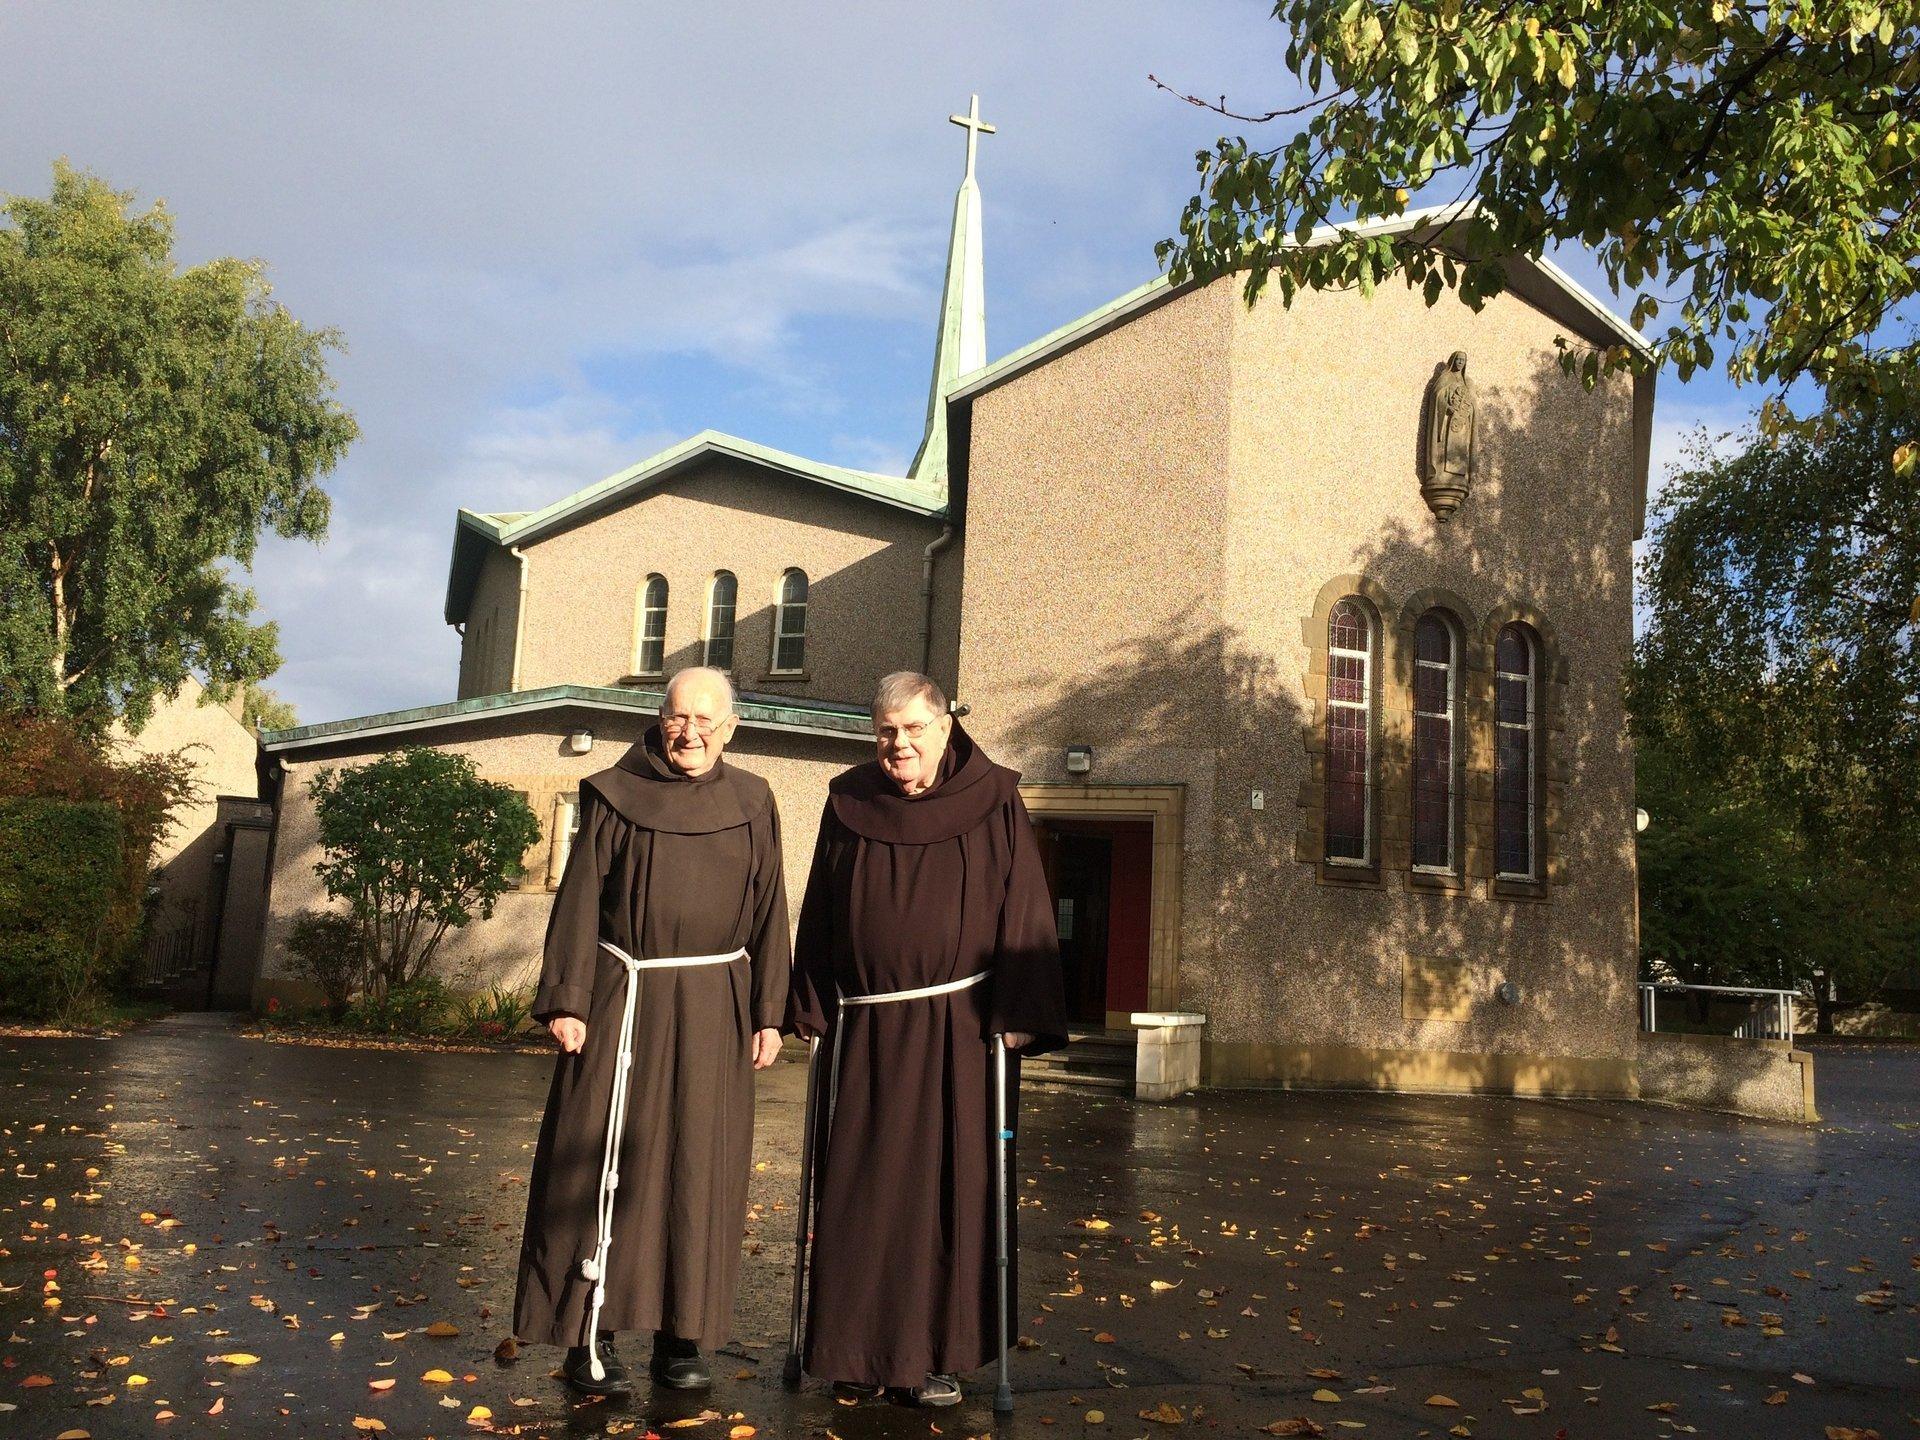 Craimillar church and friary